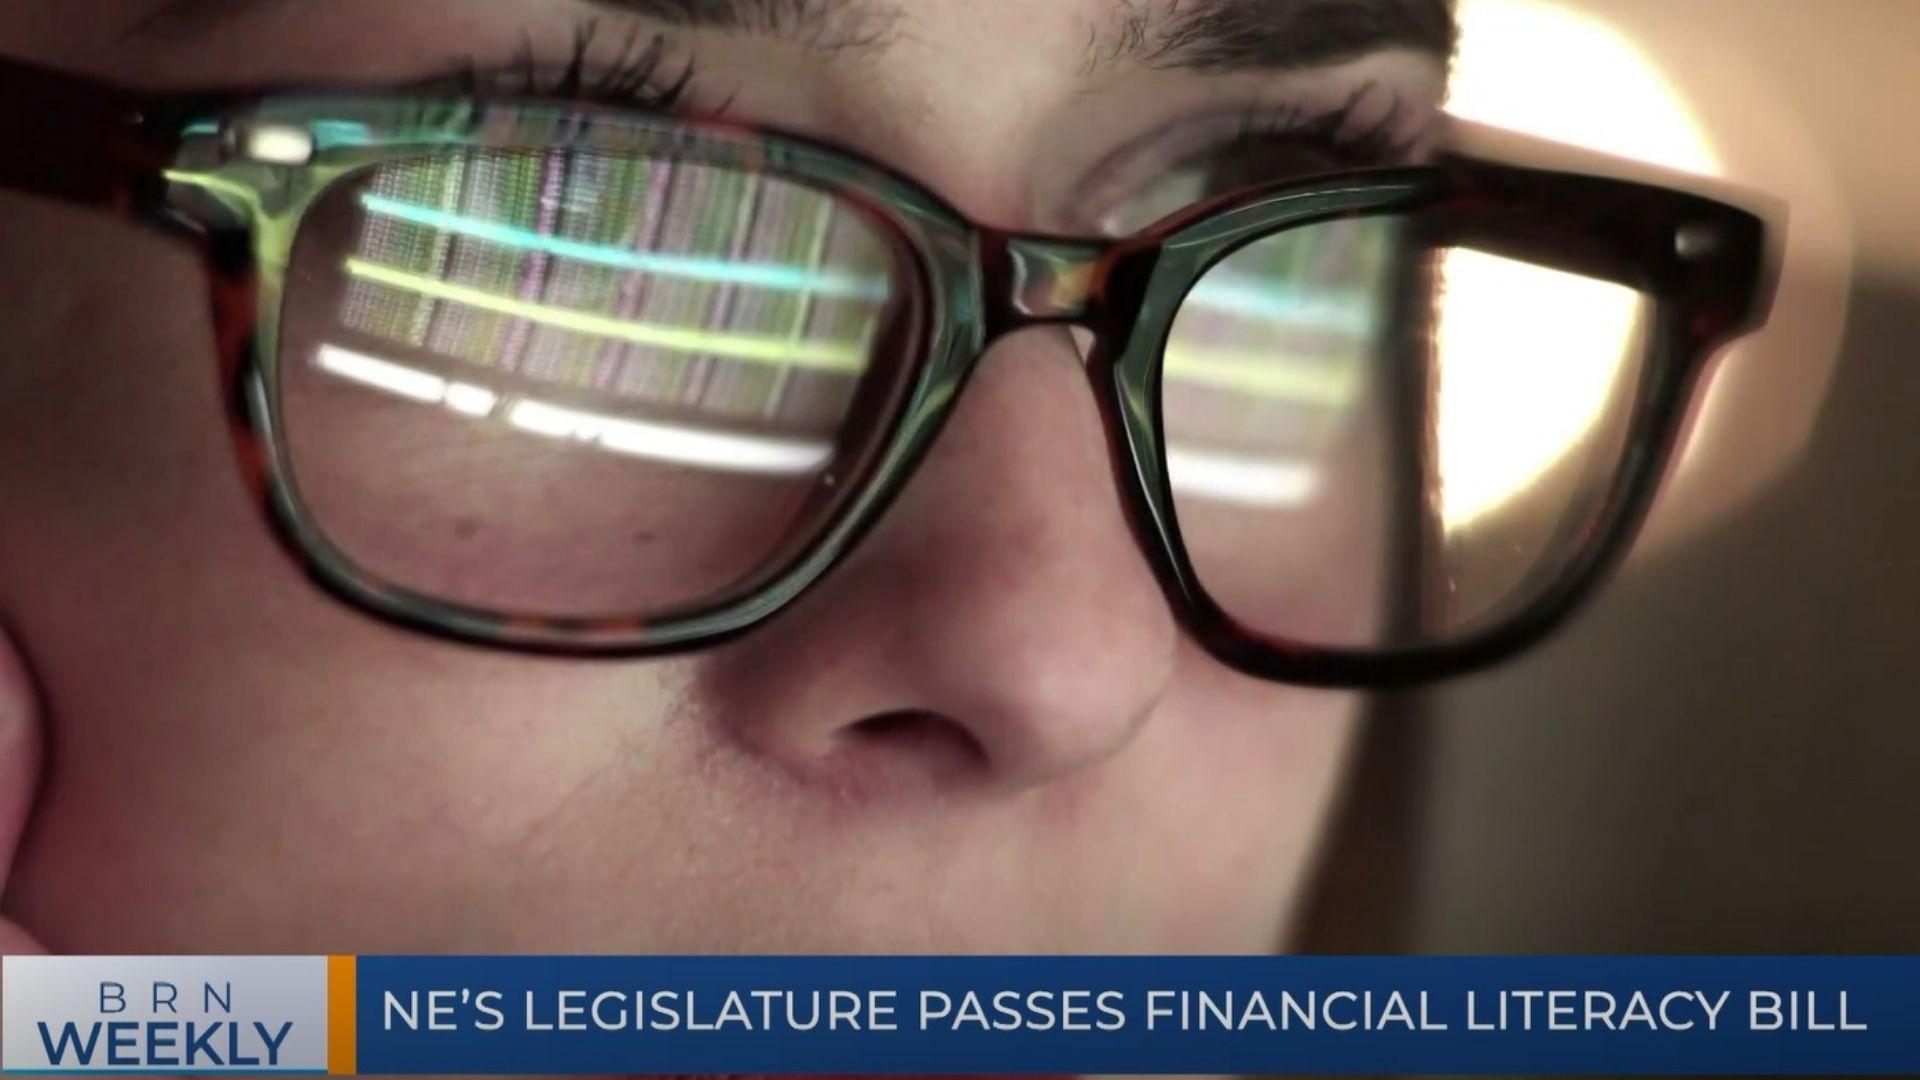 BRN Weekly | NE's Legislature Passes Financial Literacy Bill